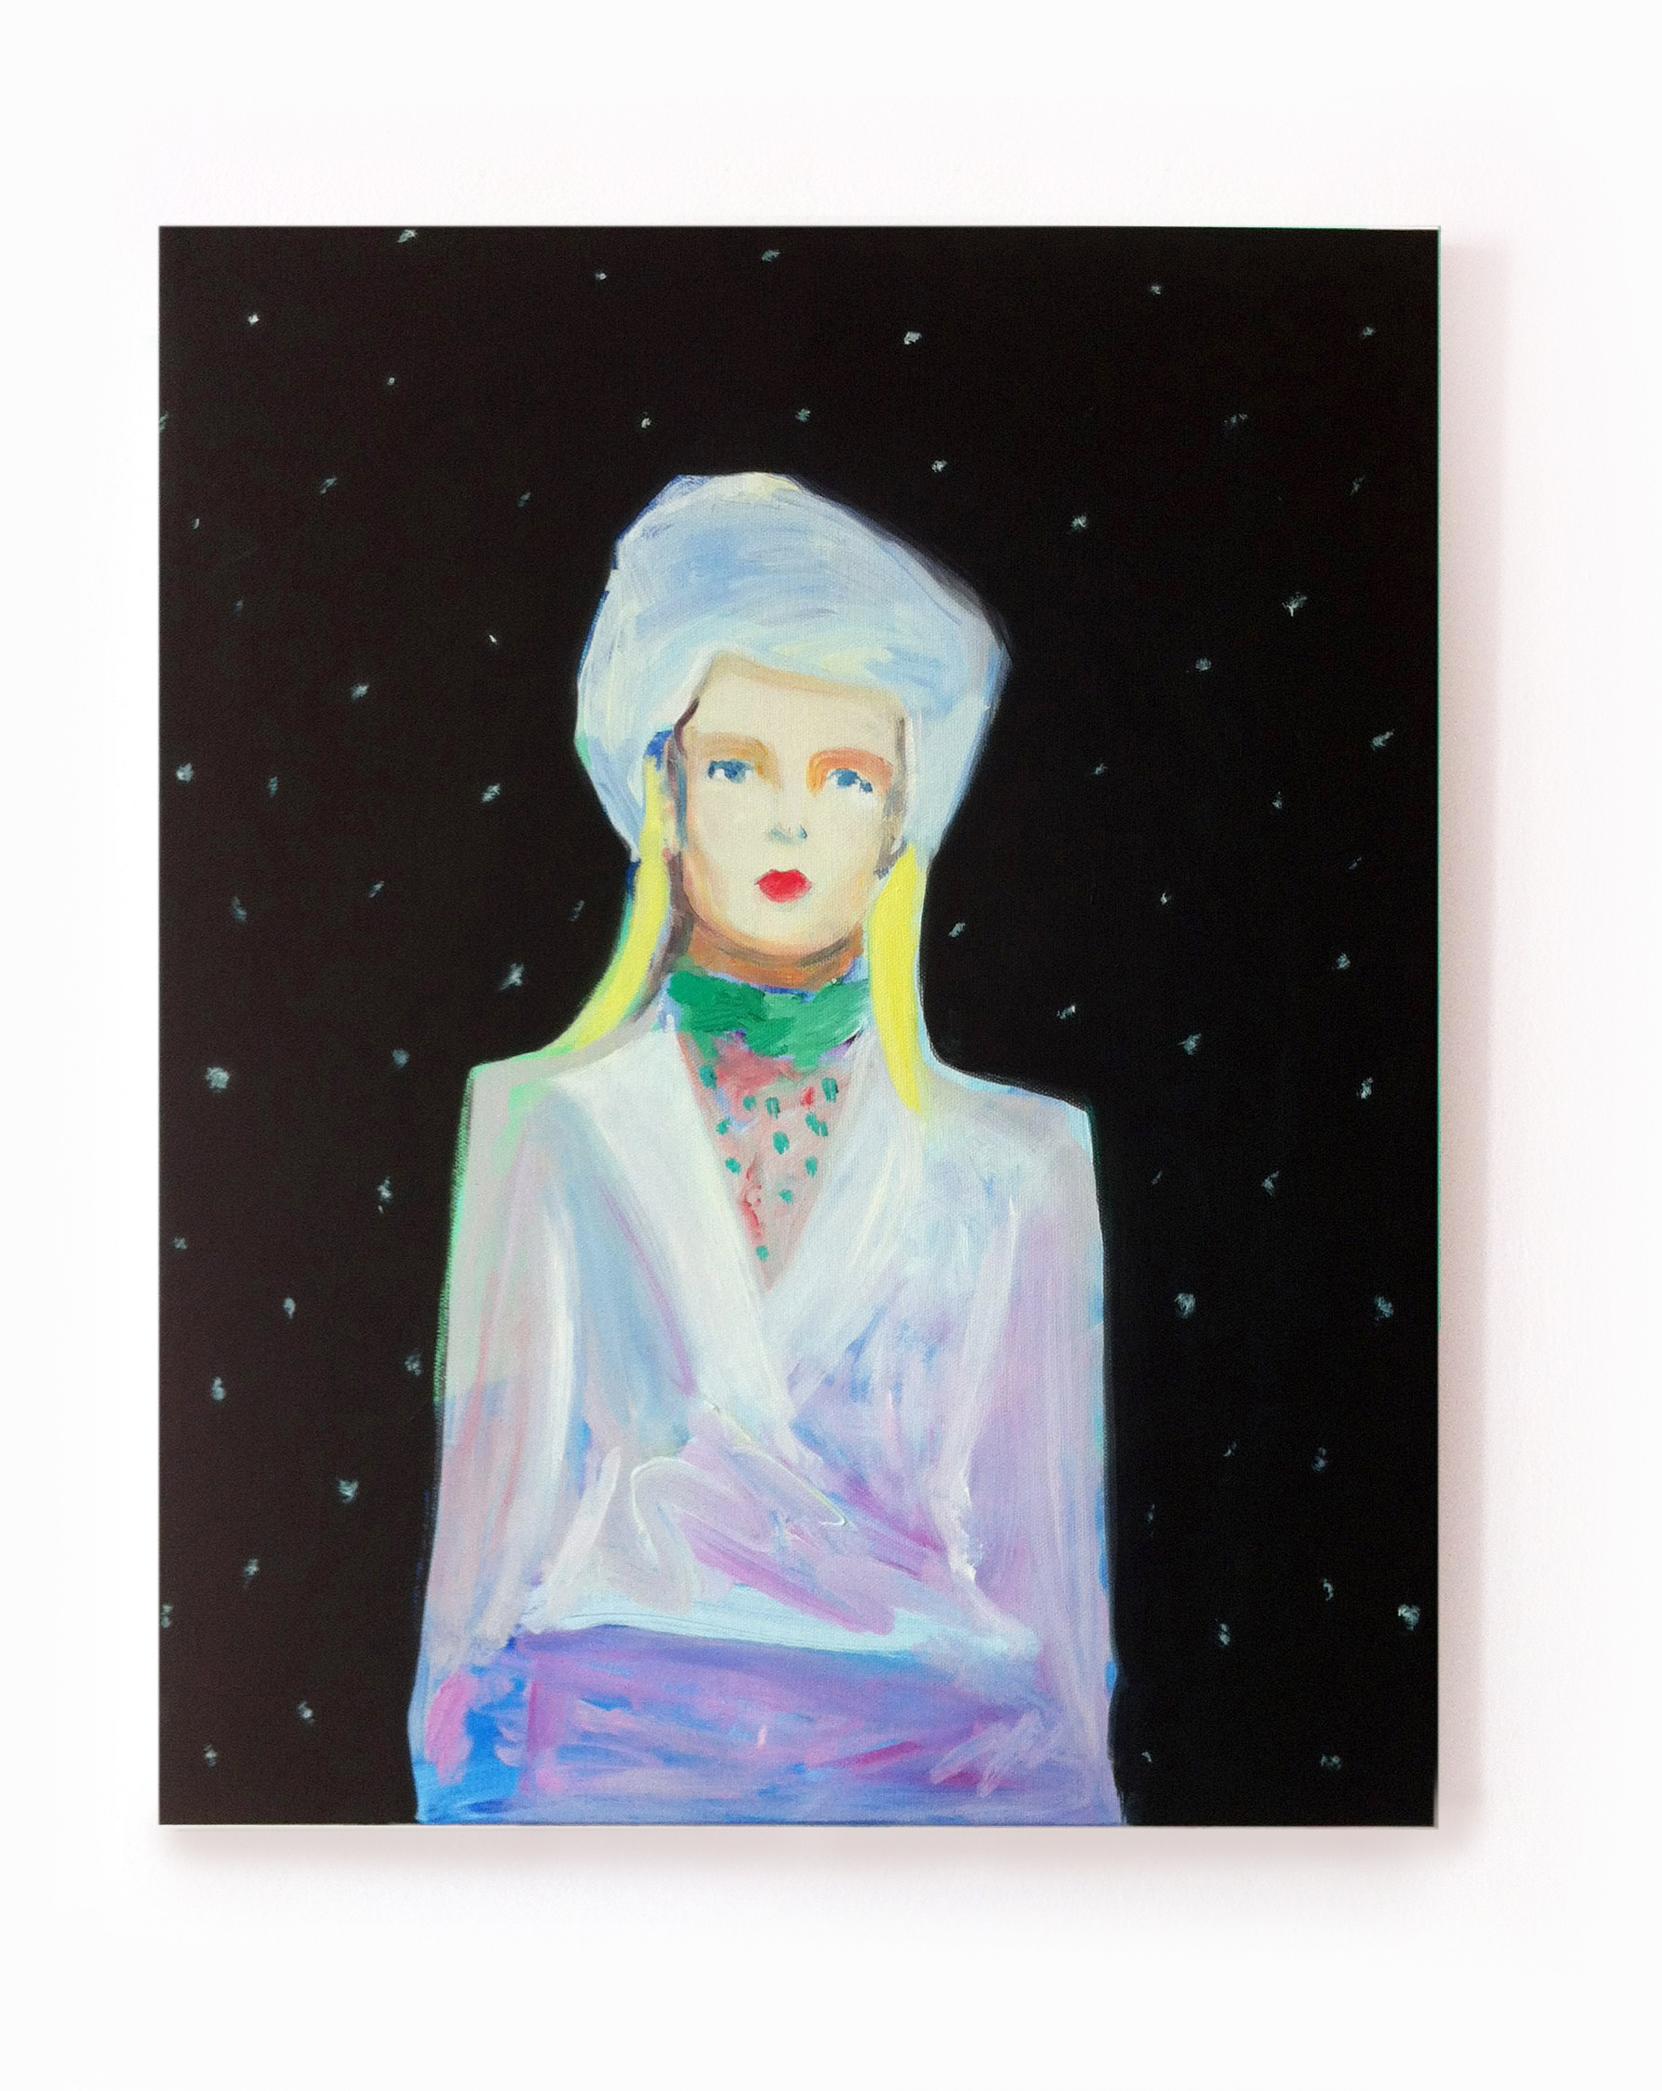 Turbante, oil on canvas,  20 x 16 inches, 2015  © Pilita Garcia